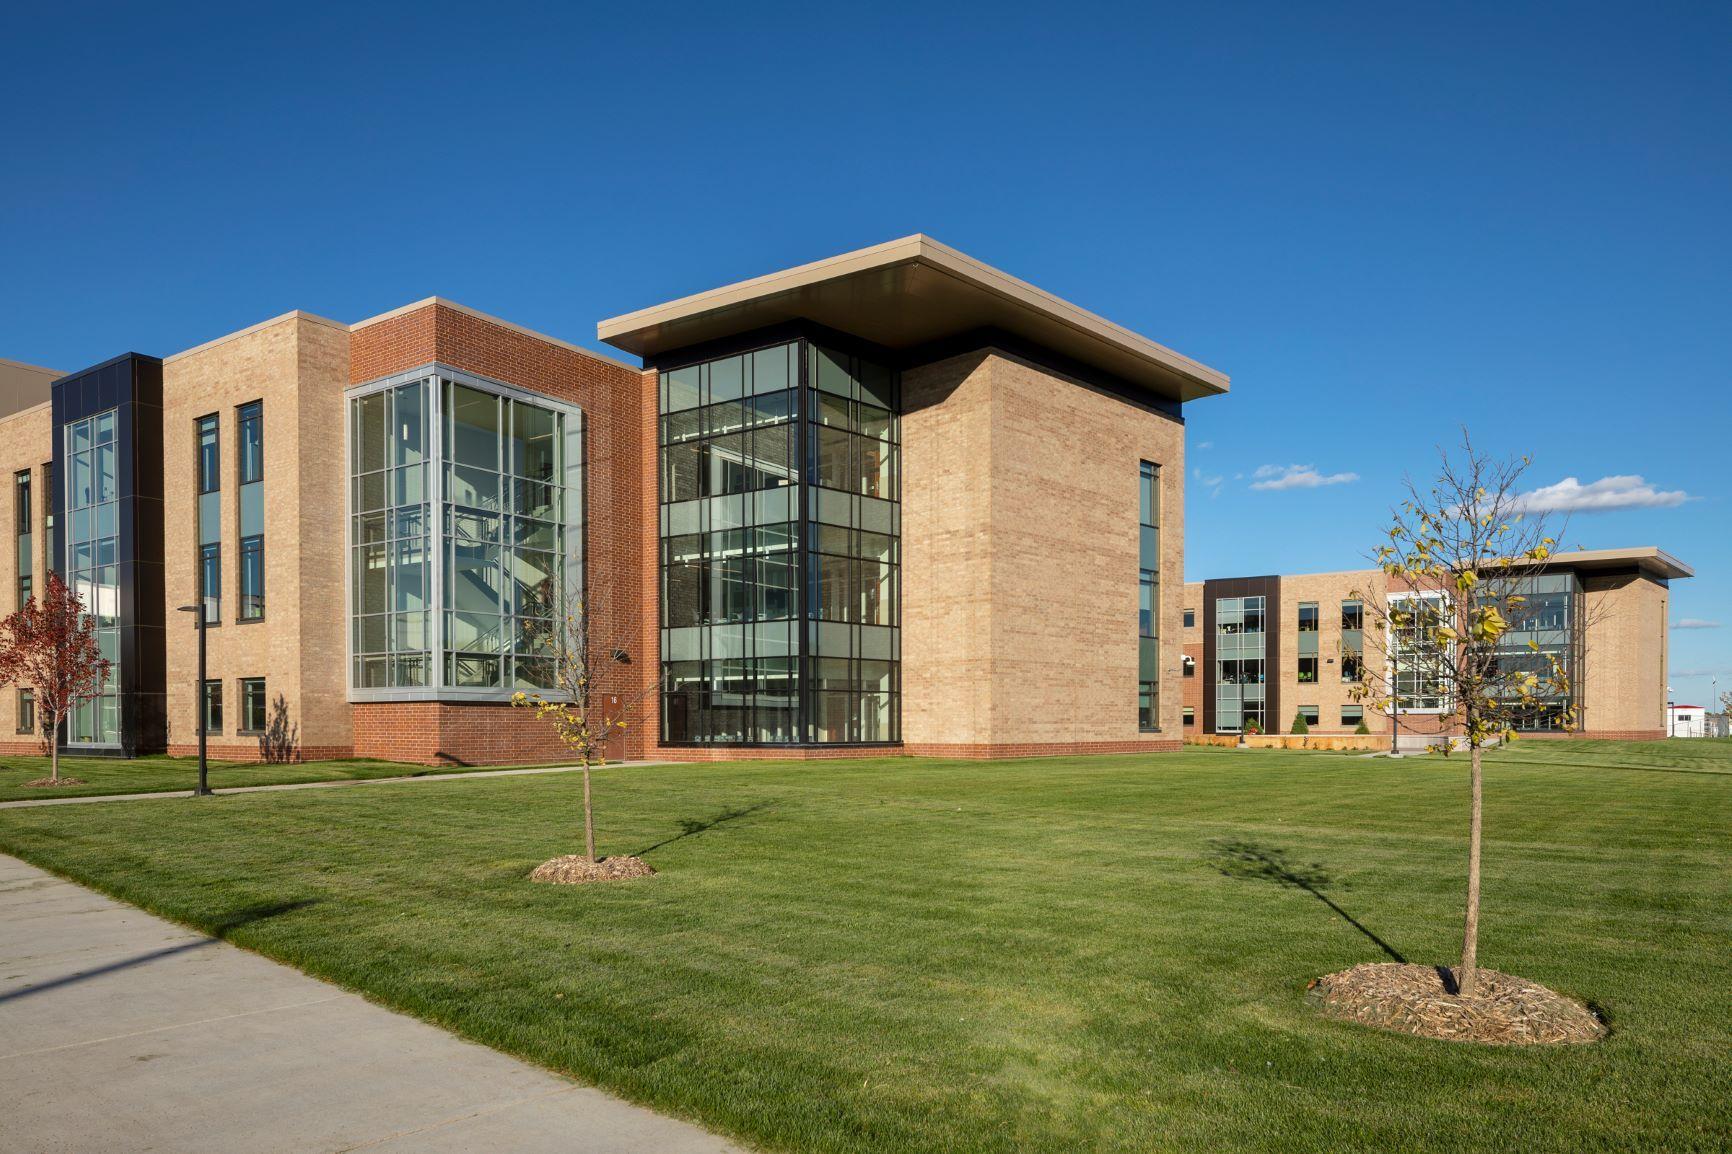 High School Exterior Design